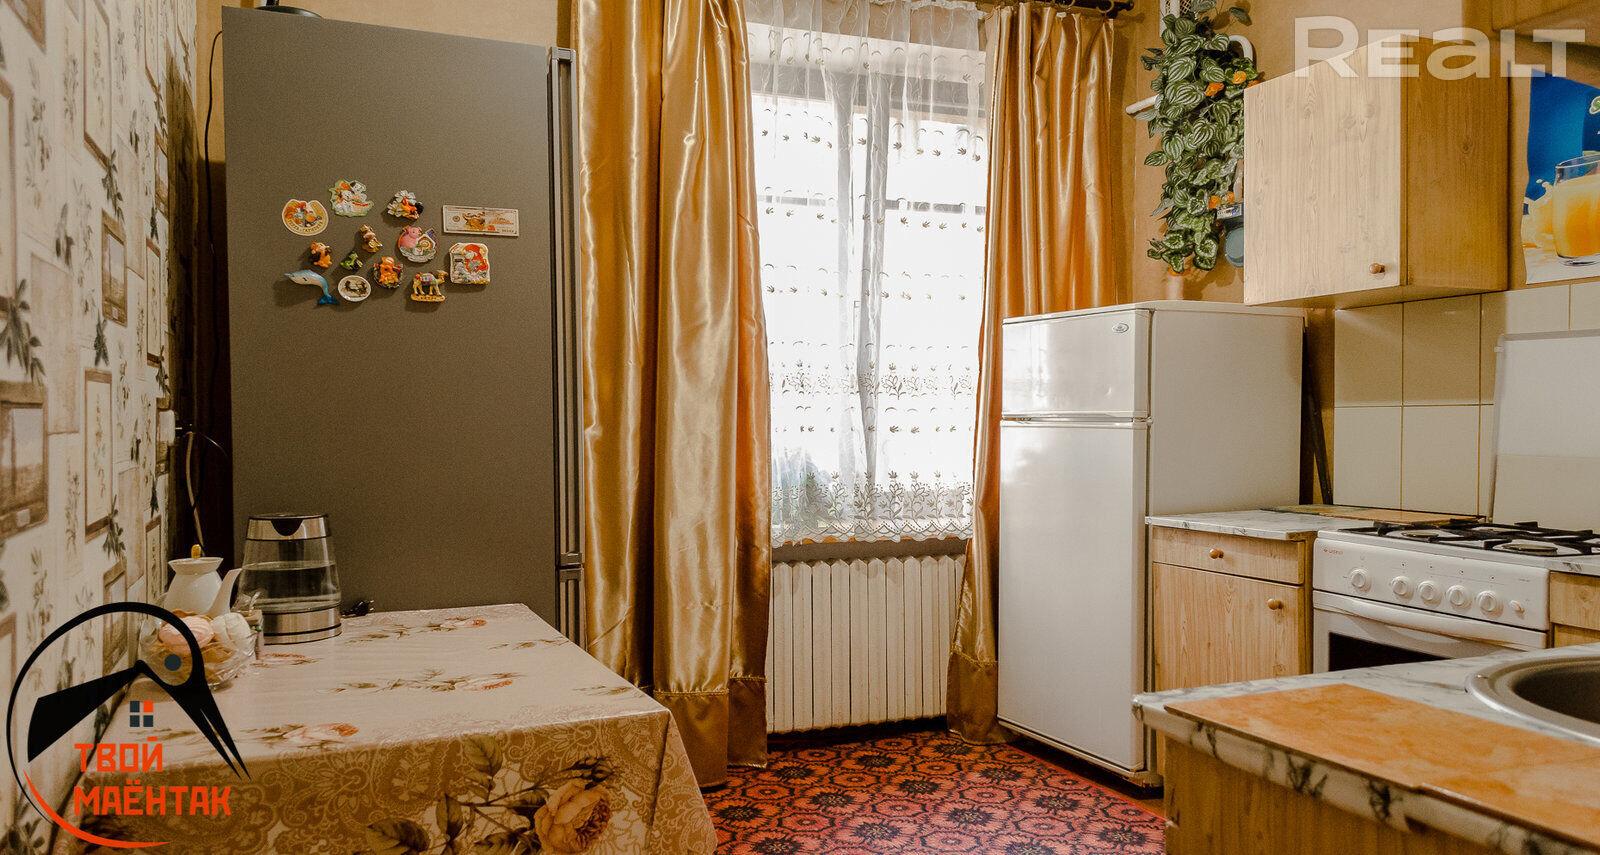 Продажа доли ( комната 15,6 м2) г. Минск, ул. Рыбалко, 2